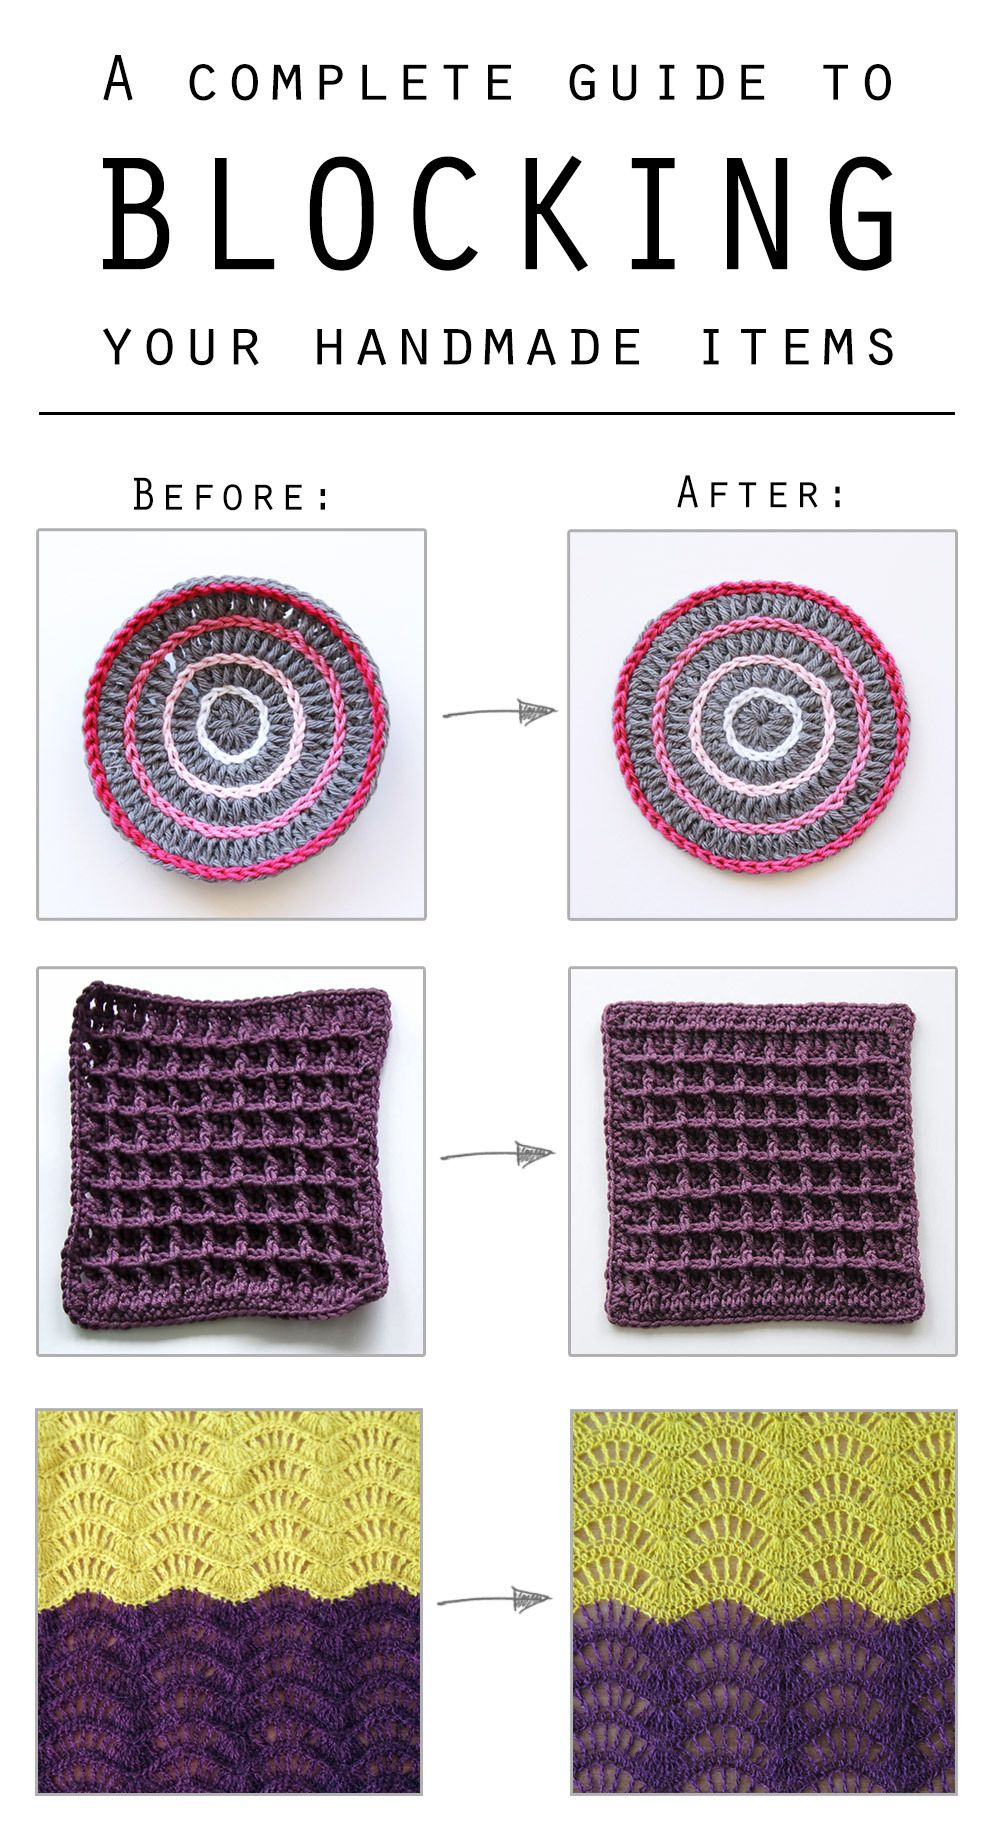 How To Block Your Crocheted Or Knitted Items Haak Maar Raak In 2020 Crochet Instructions Crochet Basics Crochet Tutorial